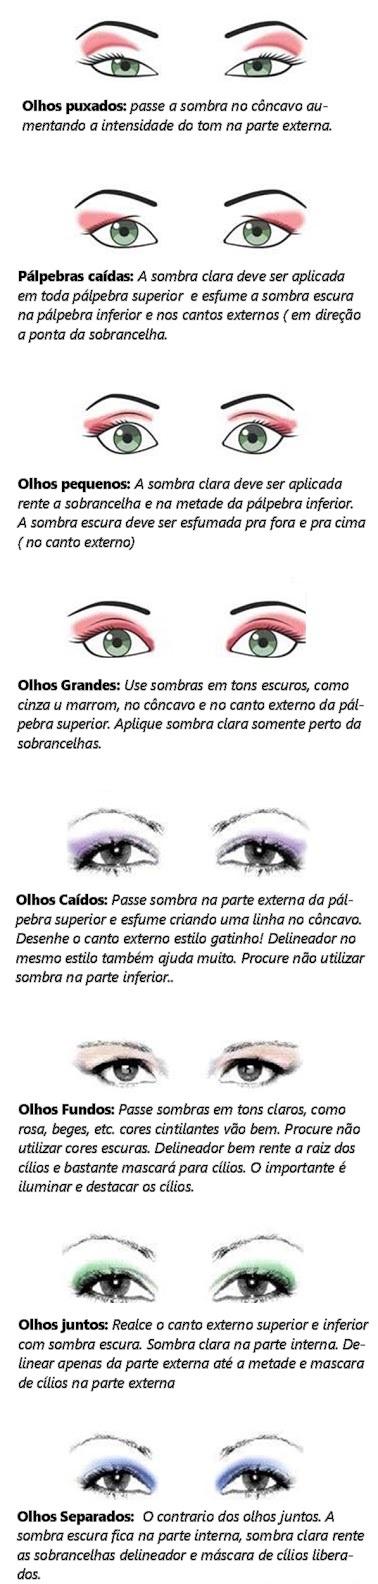 post-olhos copy